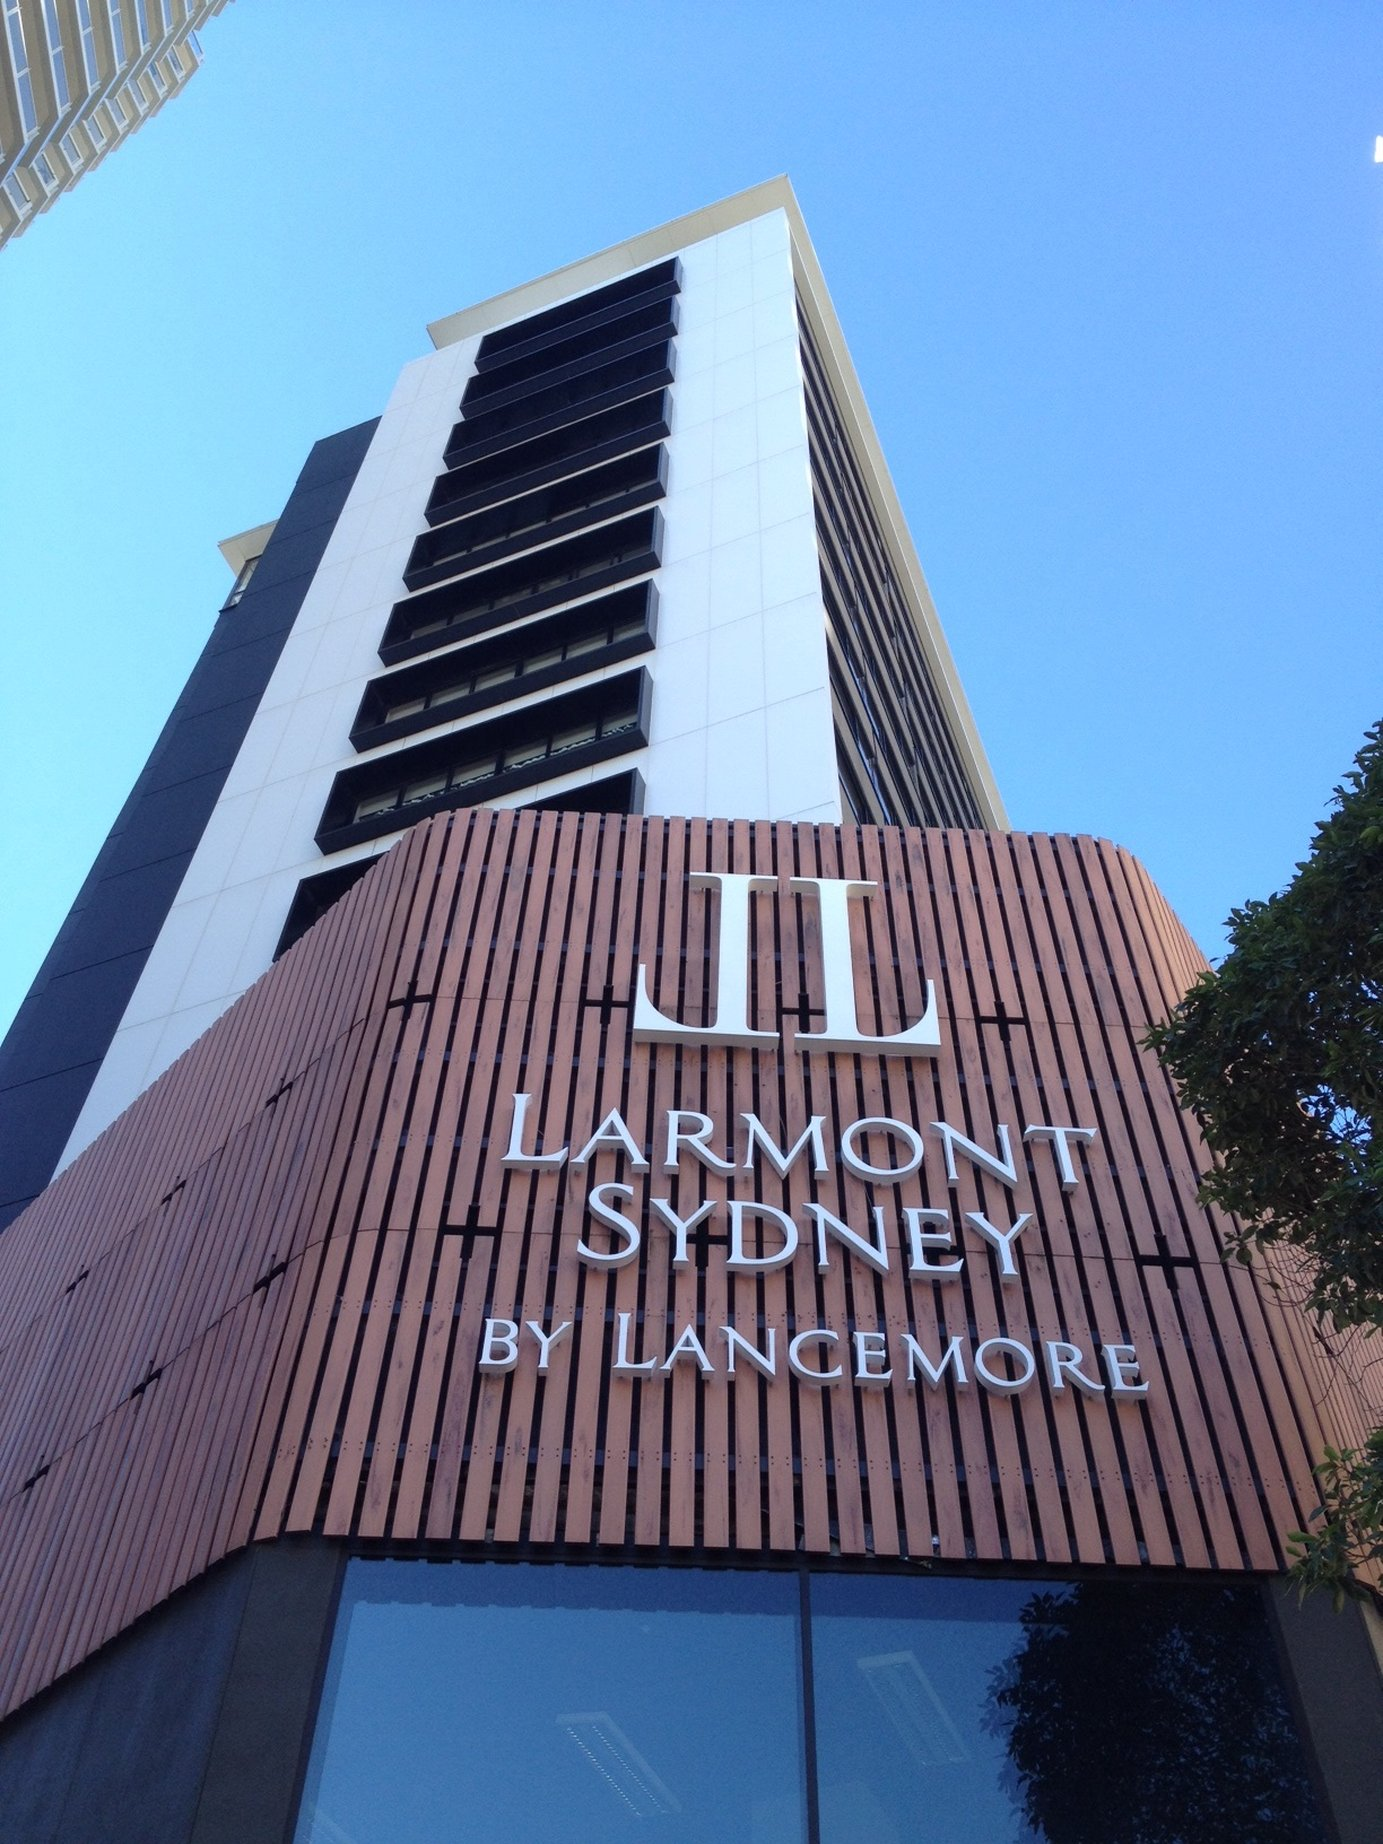 Larmont Sydney by Lancemore